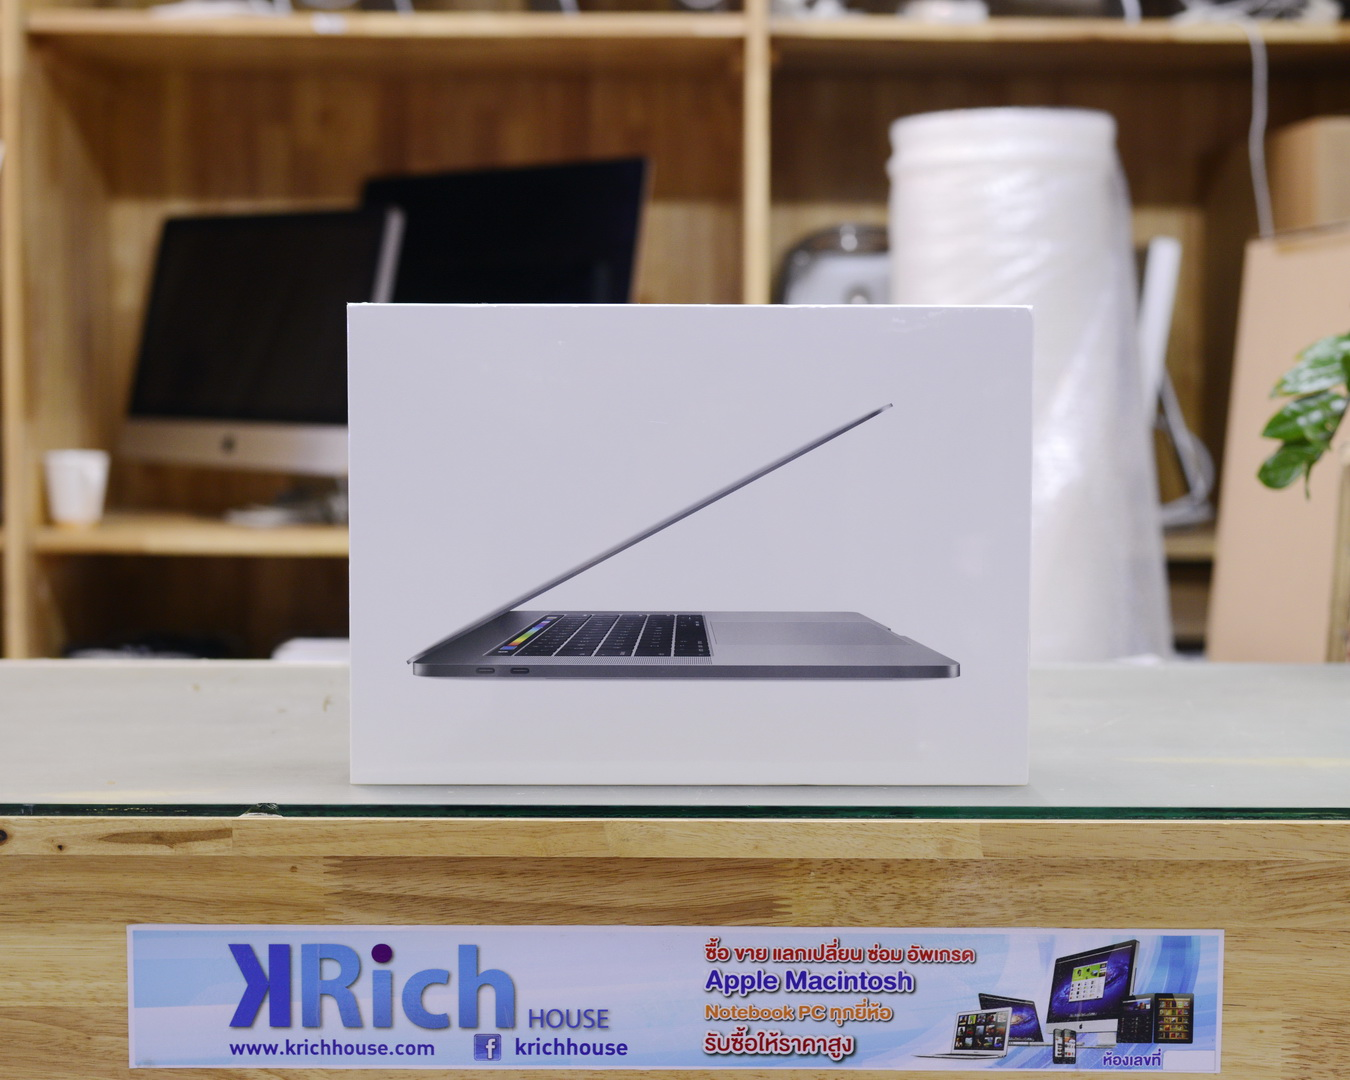 NEW - MacBook Pro (15-inch, 2017) Touch Bar, Space Grey - Quad-Core i7 2.8GHz RAM 16GB SSD 256GB Radeon Pro 555 2GB - Apple Warranty 1 y.